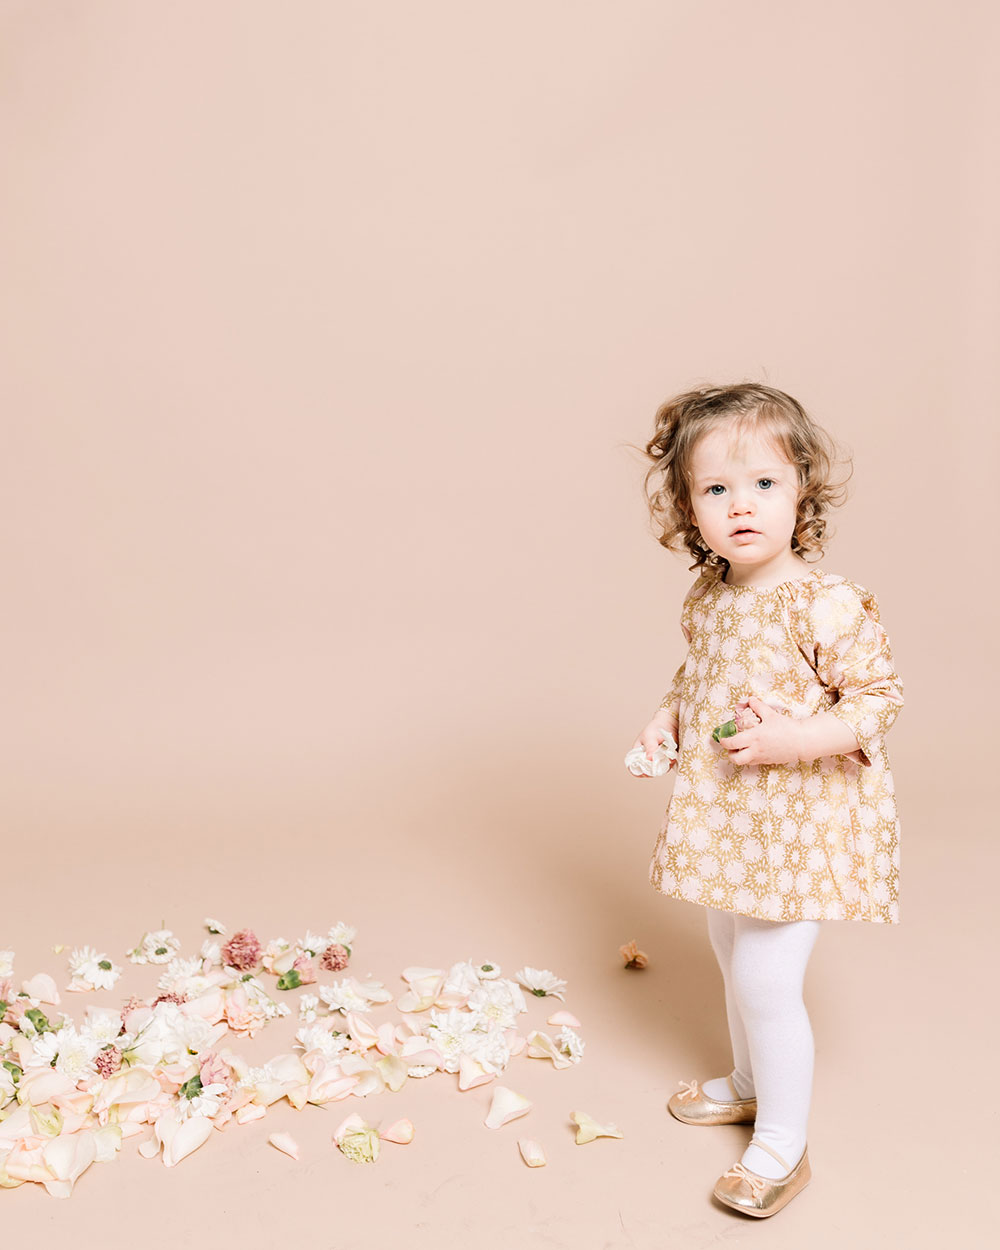 valentine's popup shoot by Boston based designer mStarr desigN